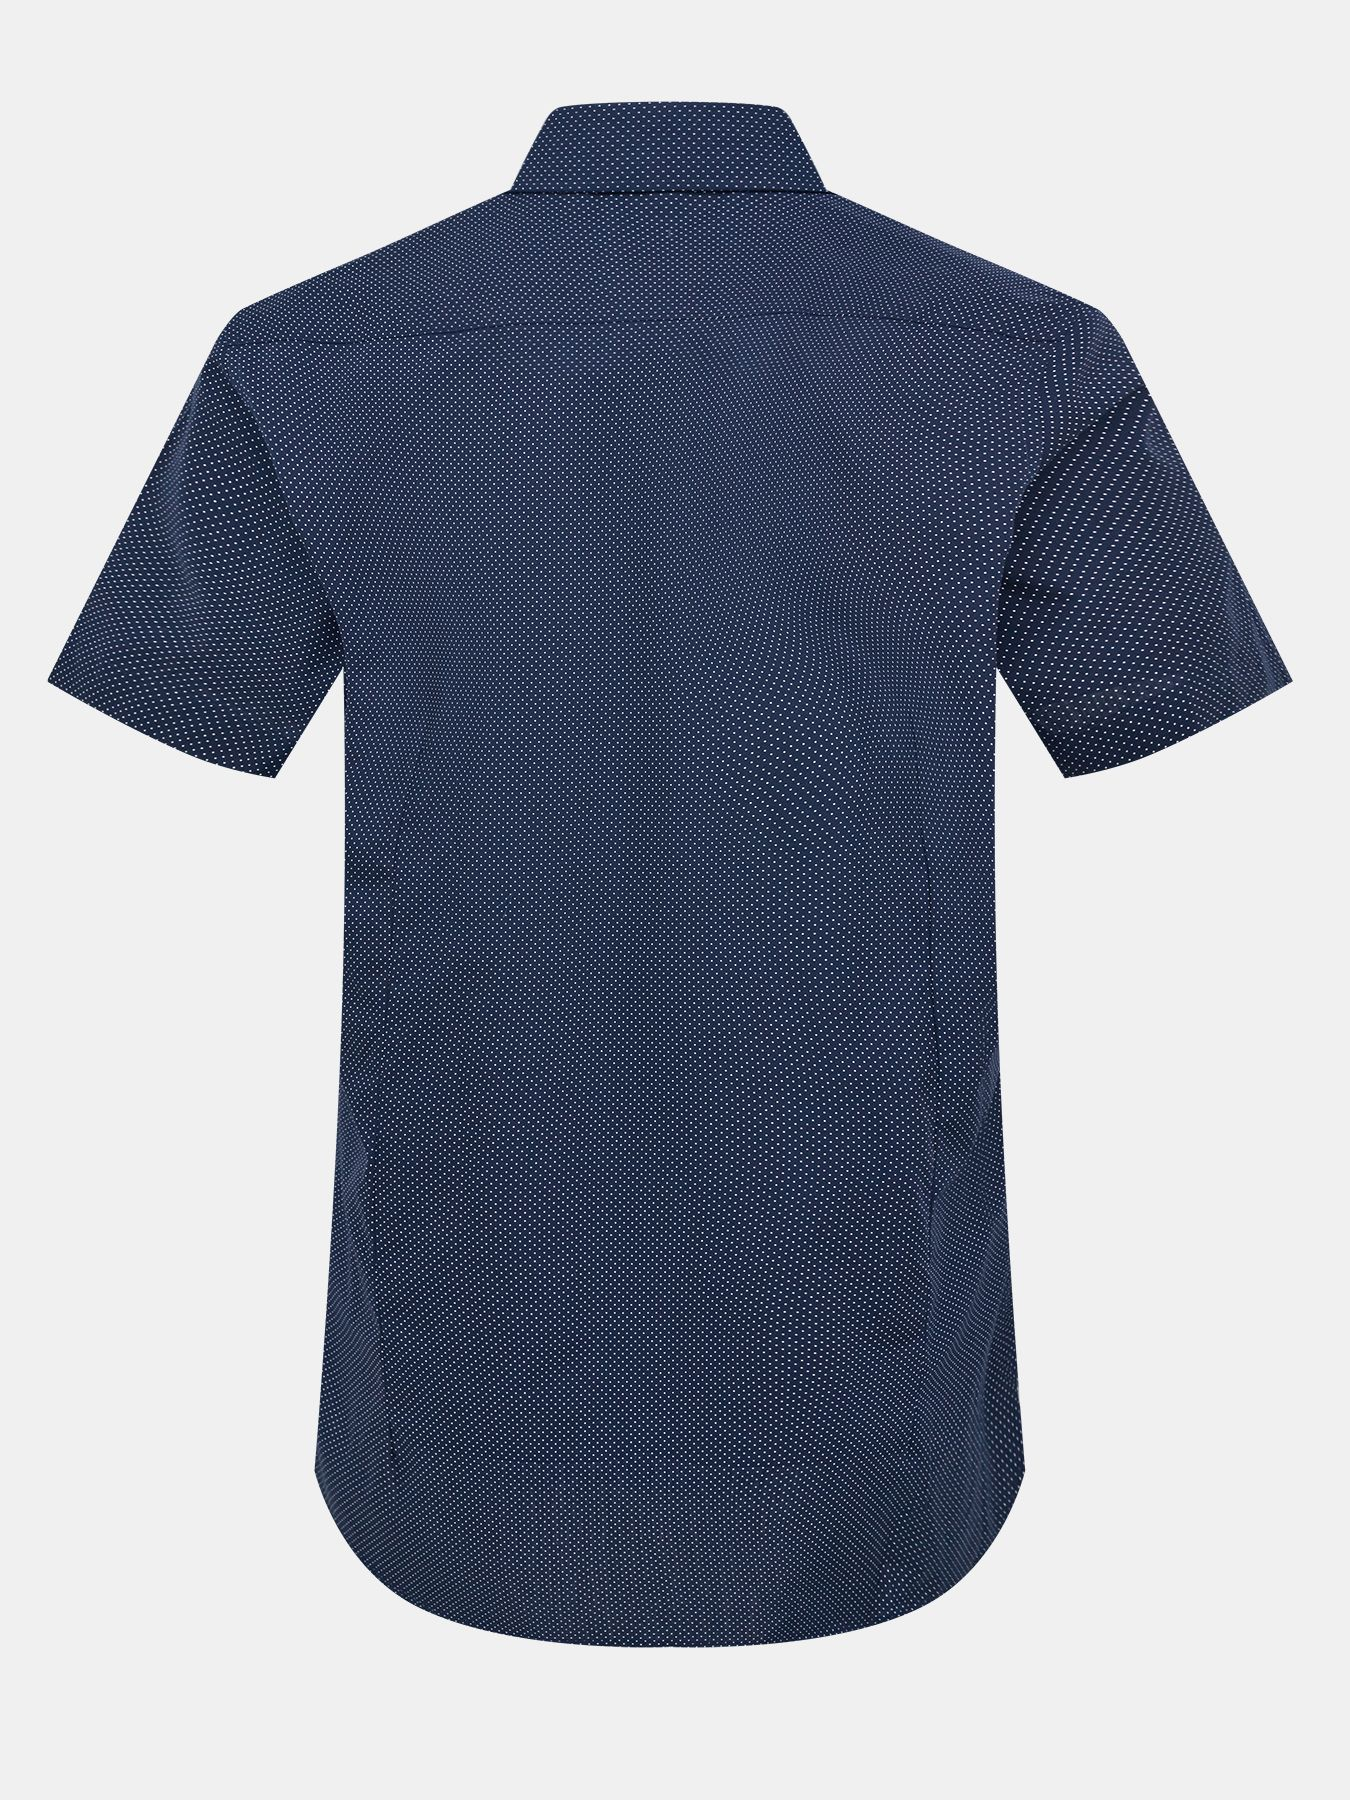 Рубашка Seidensticker Рубашка рубашка bawer bawer mp002xw0r3l2